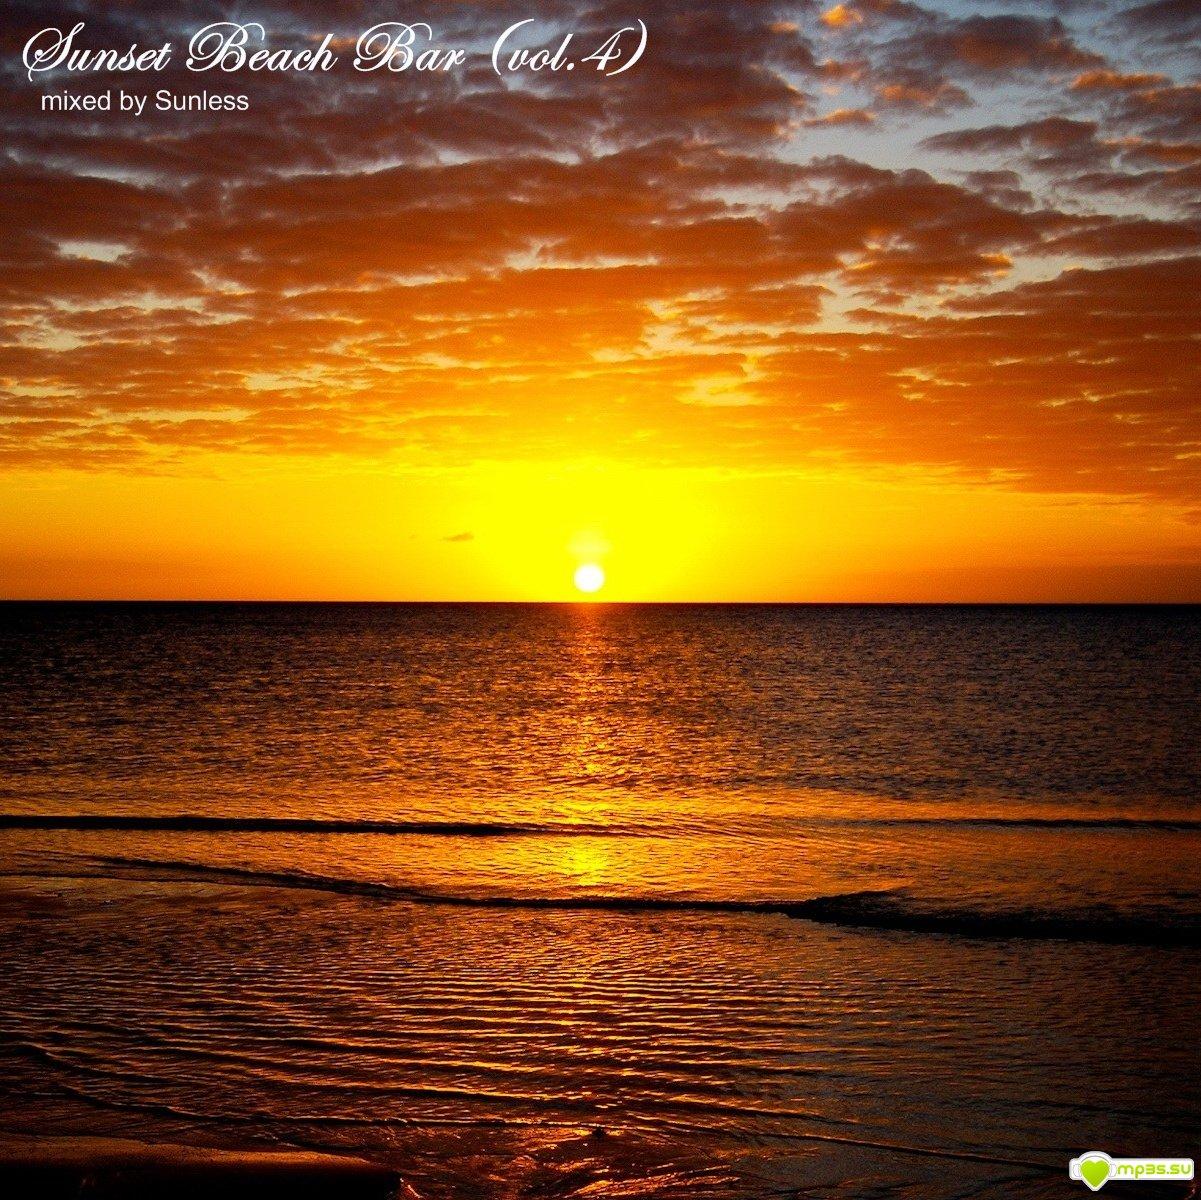 pinterest labels flowers wallpaper sunset beach sunset beach wallpaper 1201x1200